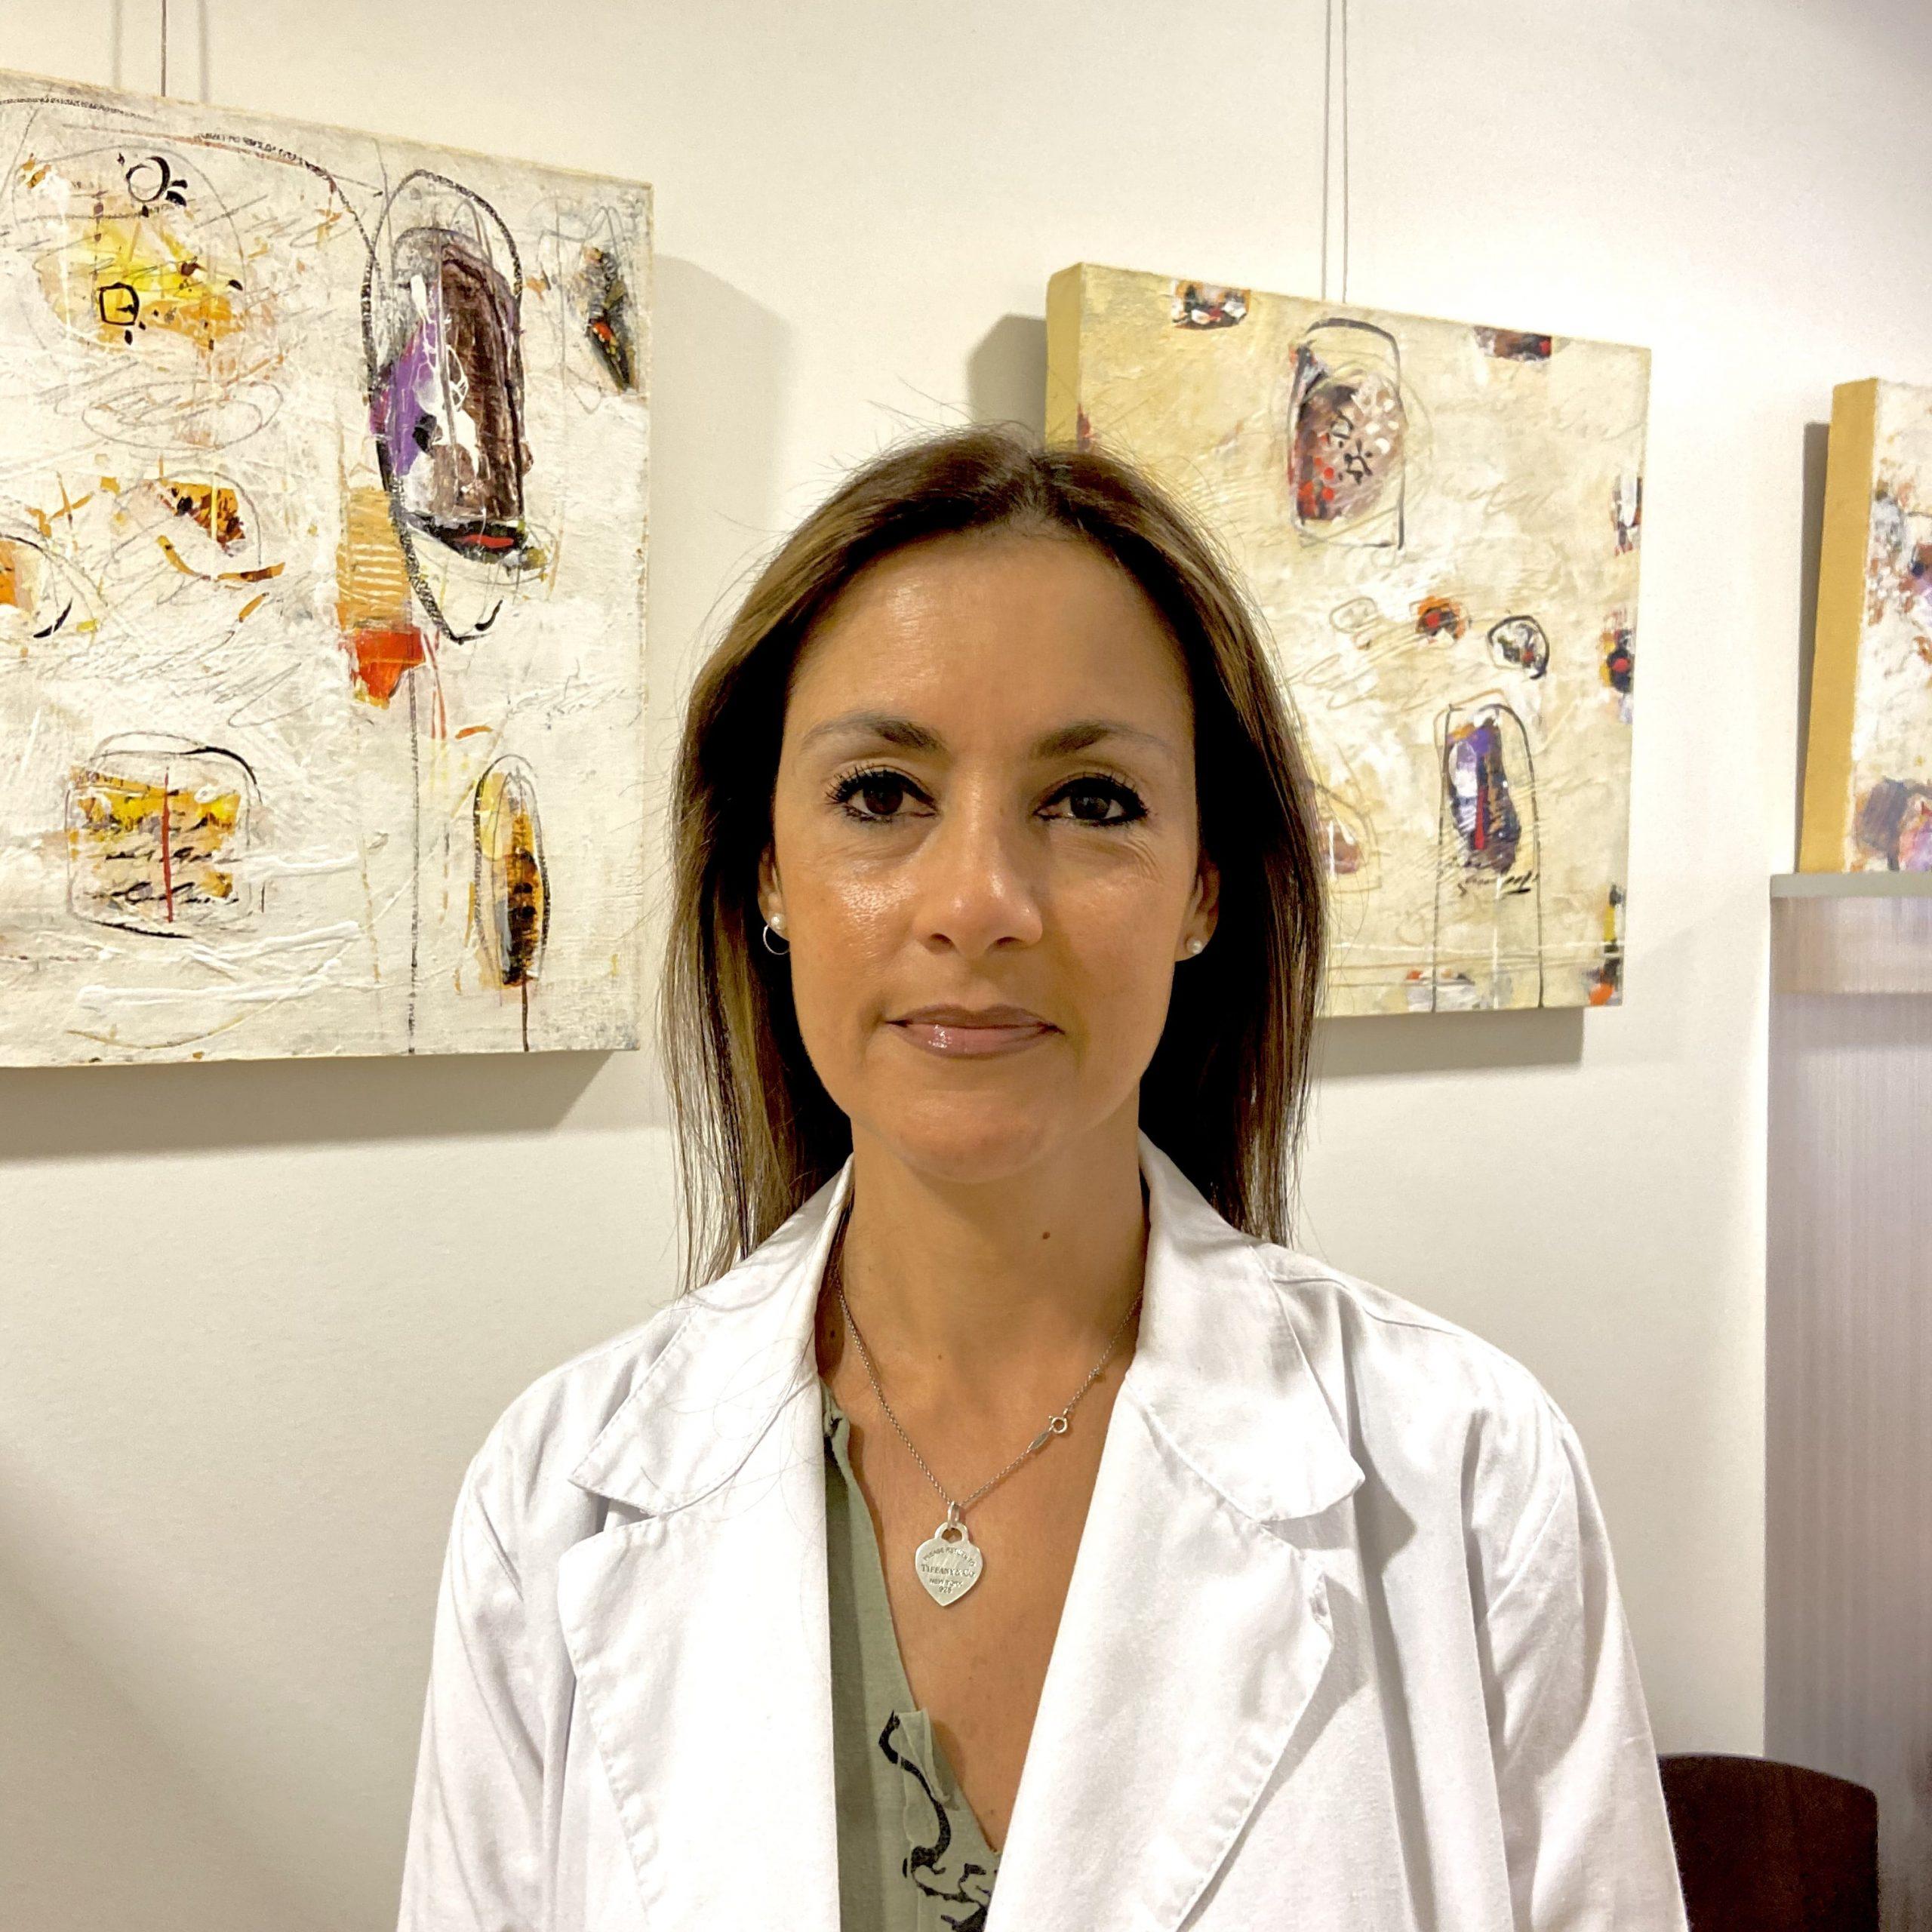 Dott. Arcudi Valeria